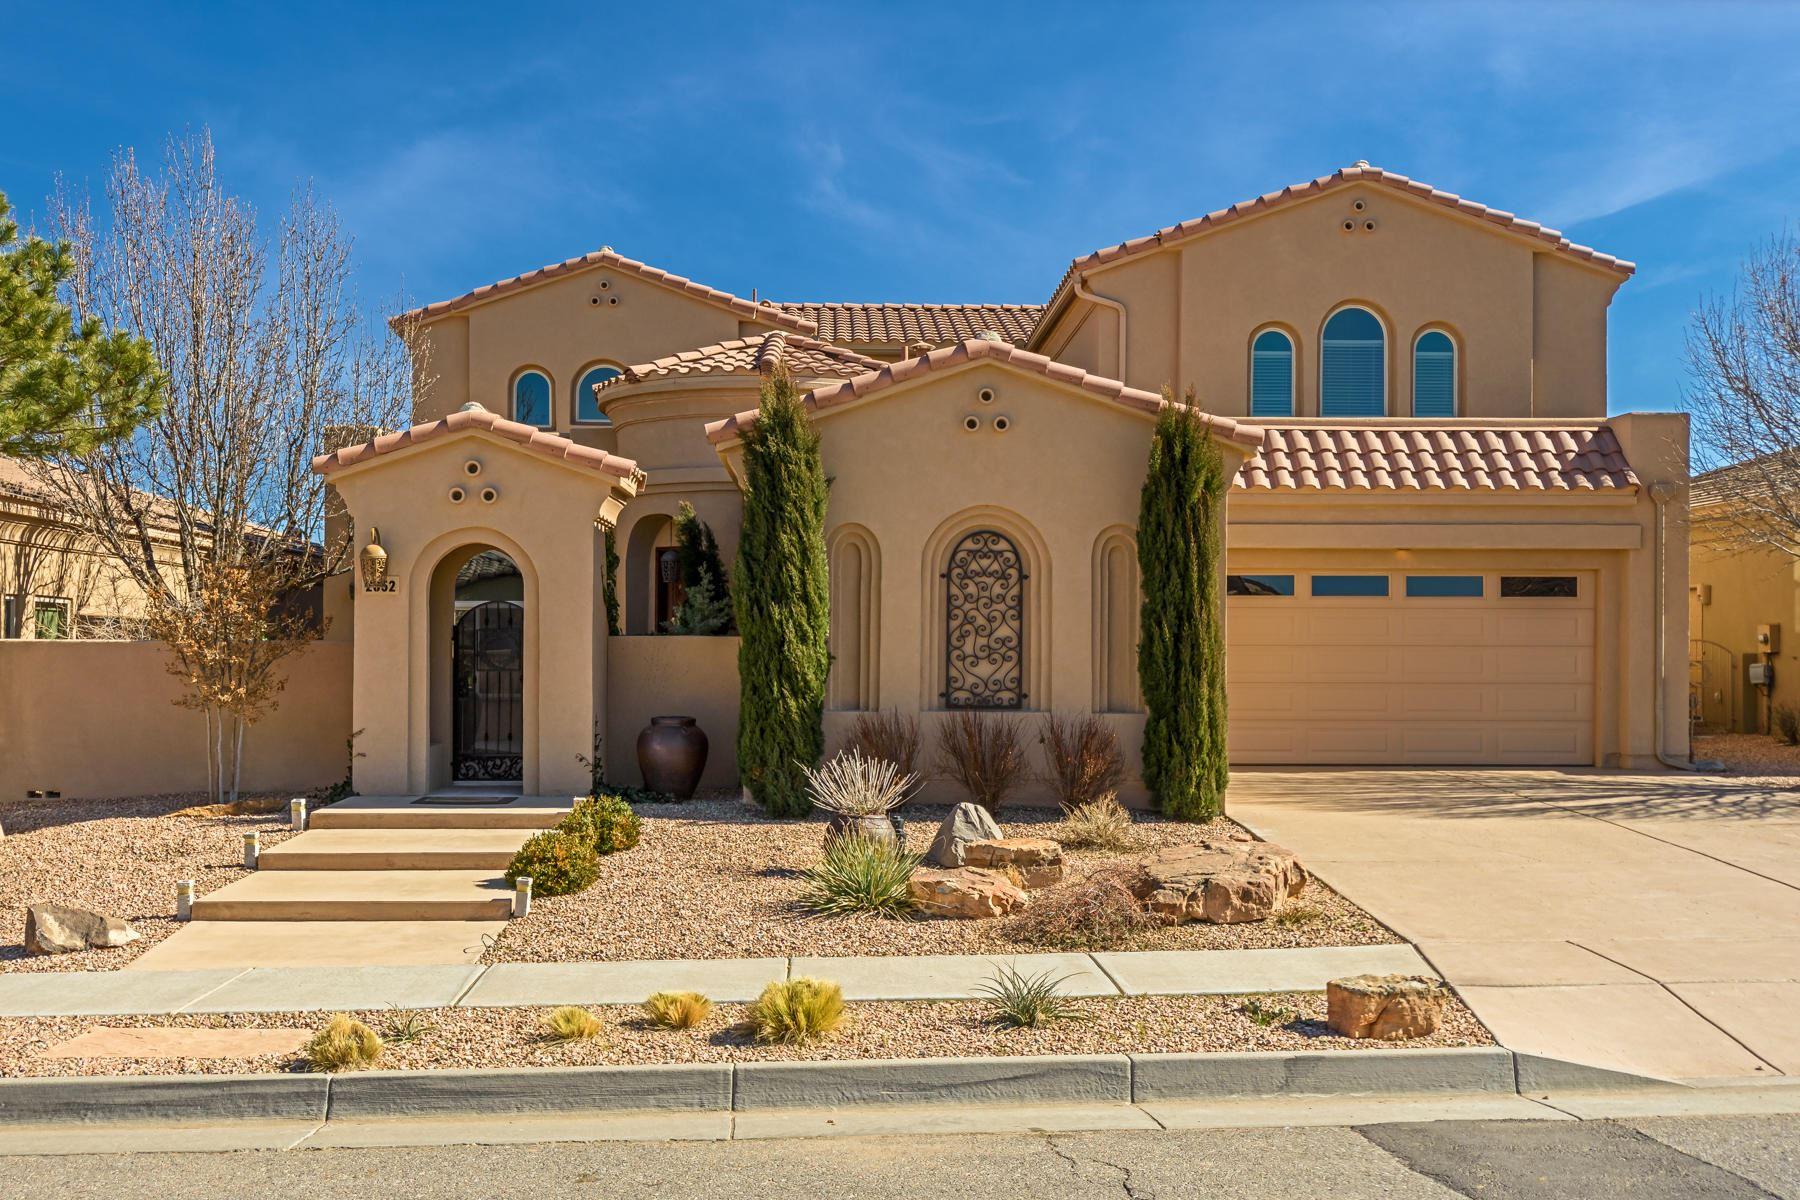 Photo of 2852 LA LUZ Circle NE, Rio Rancho, NM 87144 (MLS # 971313)